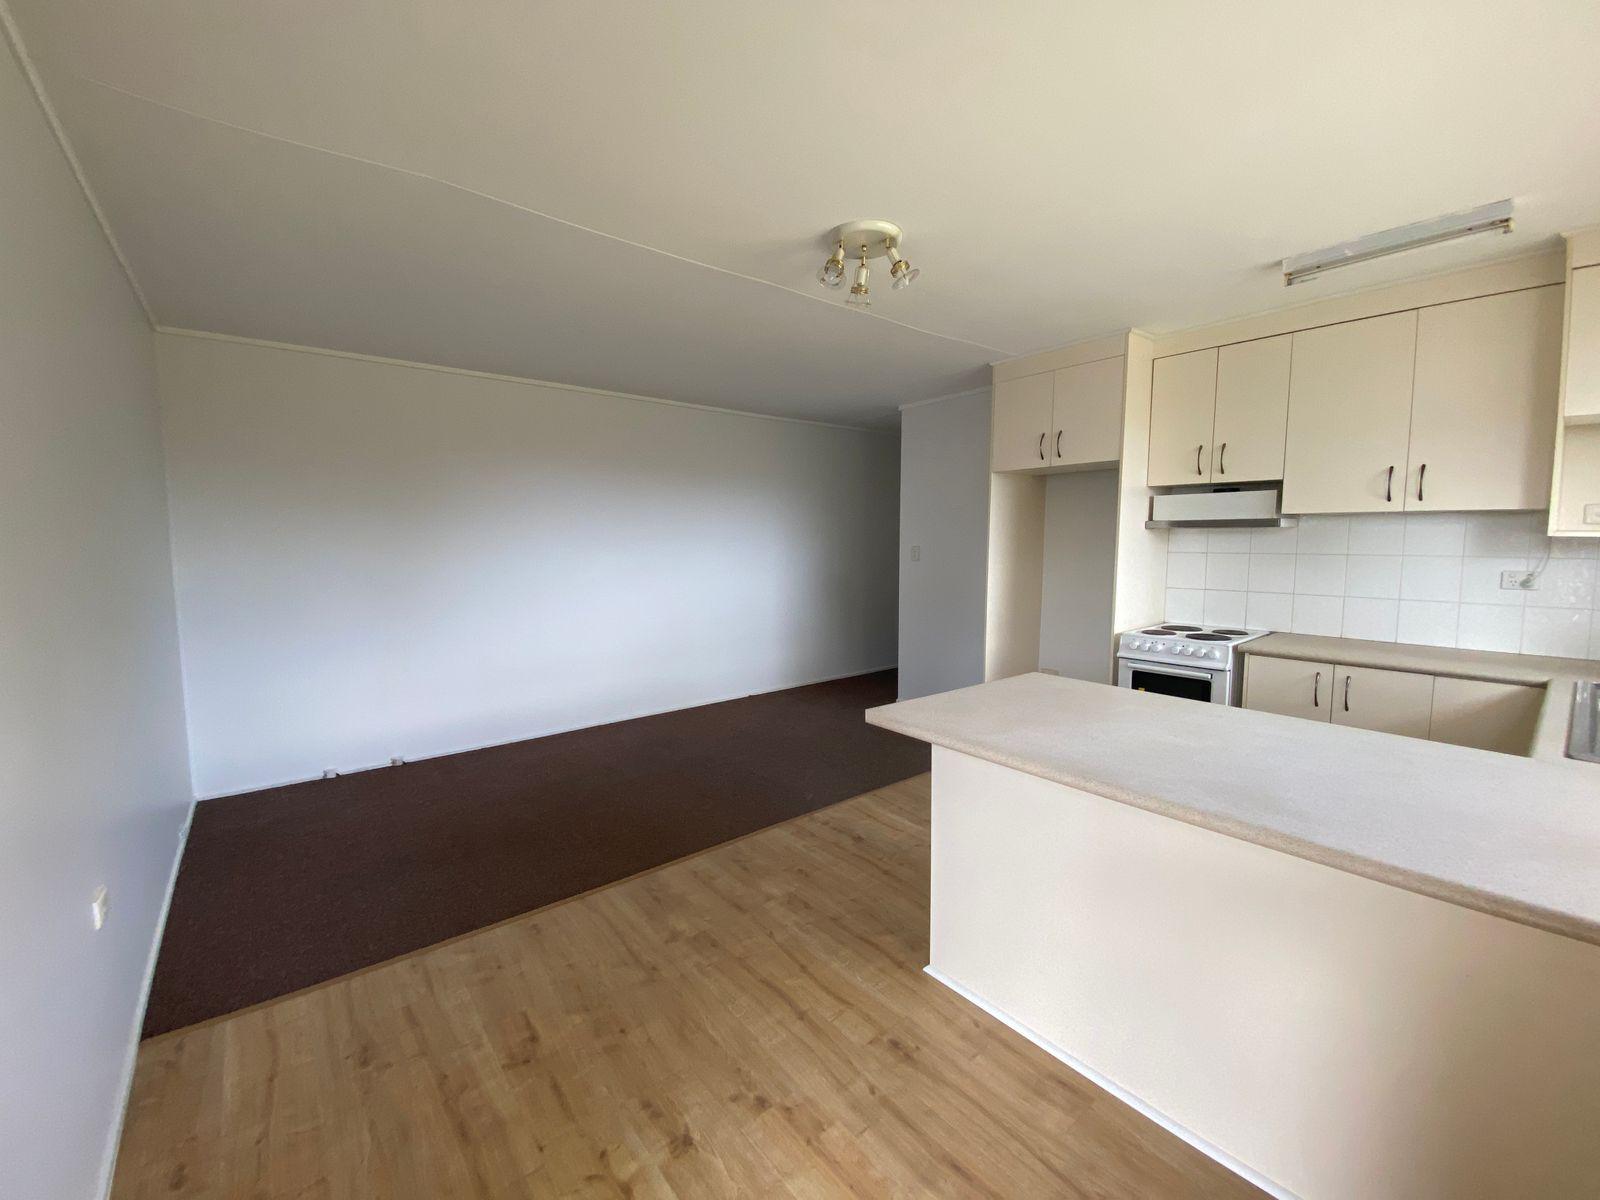 3/89 Macdonald Street, Norman Park, QLD 4170